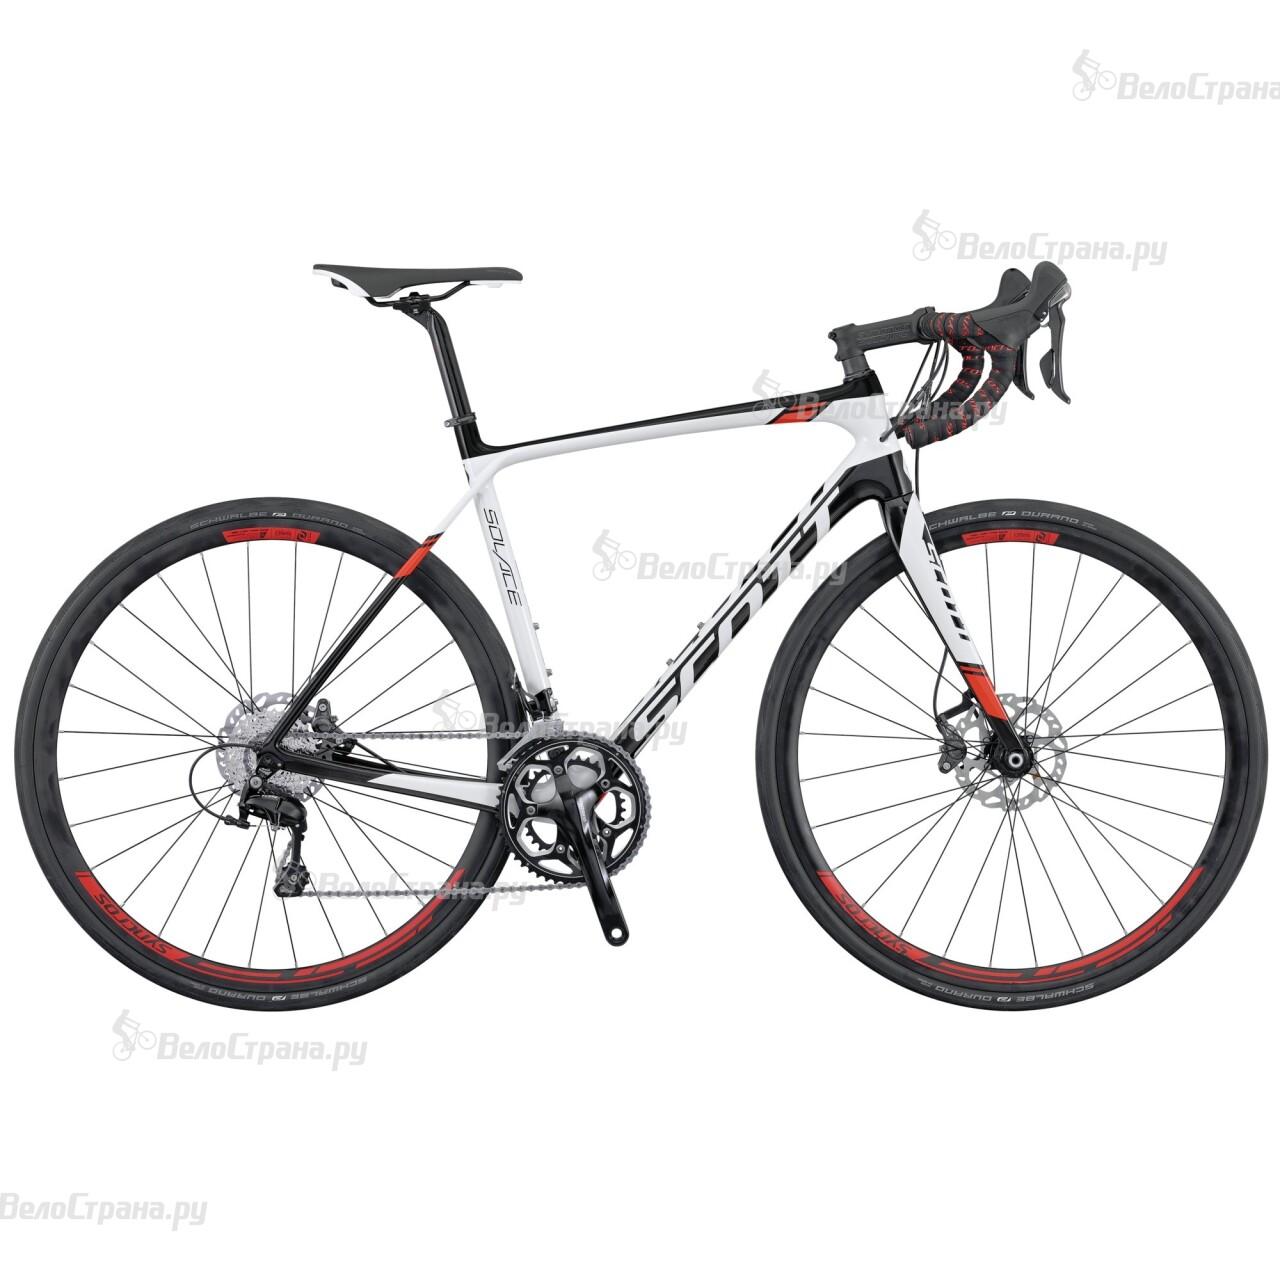 Велосипед Scott Solace 20 Disc (2016) велосипед scott solace 40 fb disc 2015